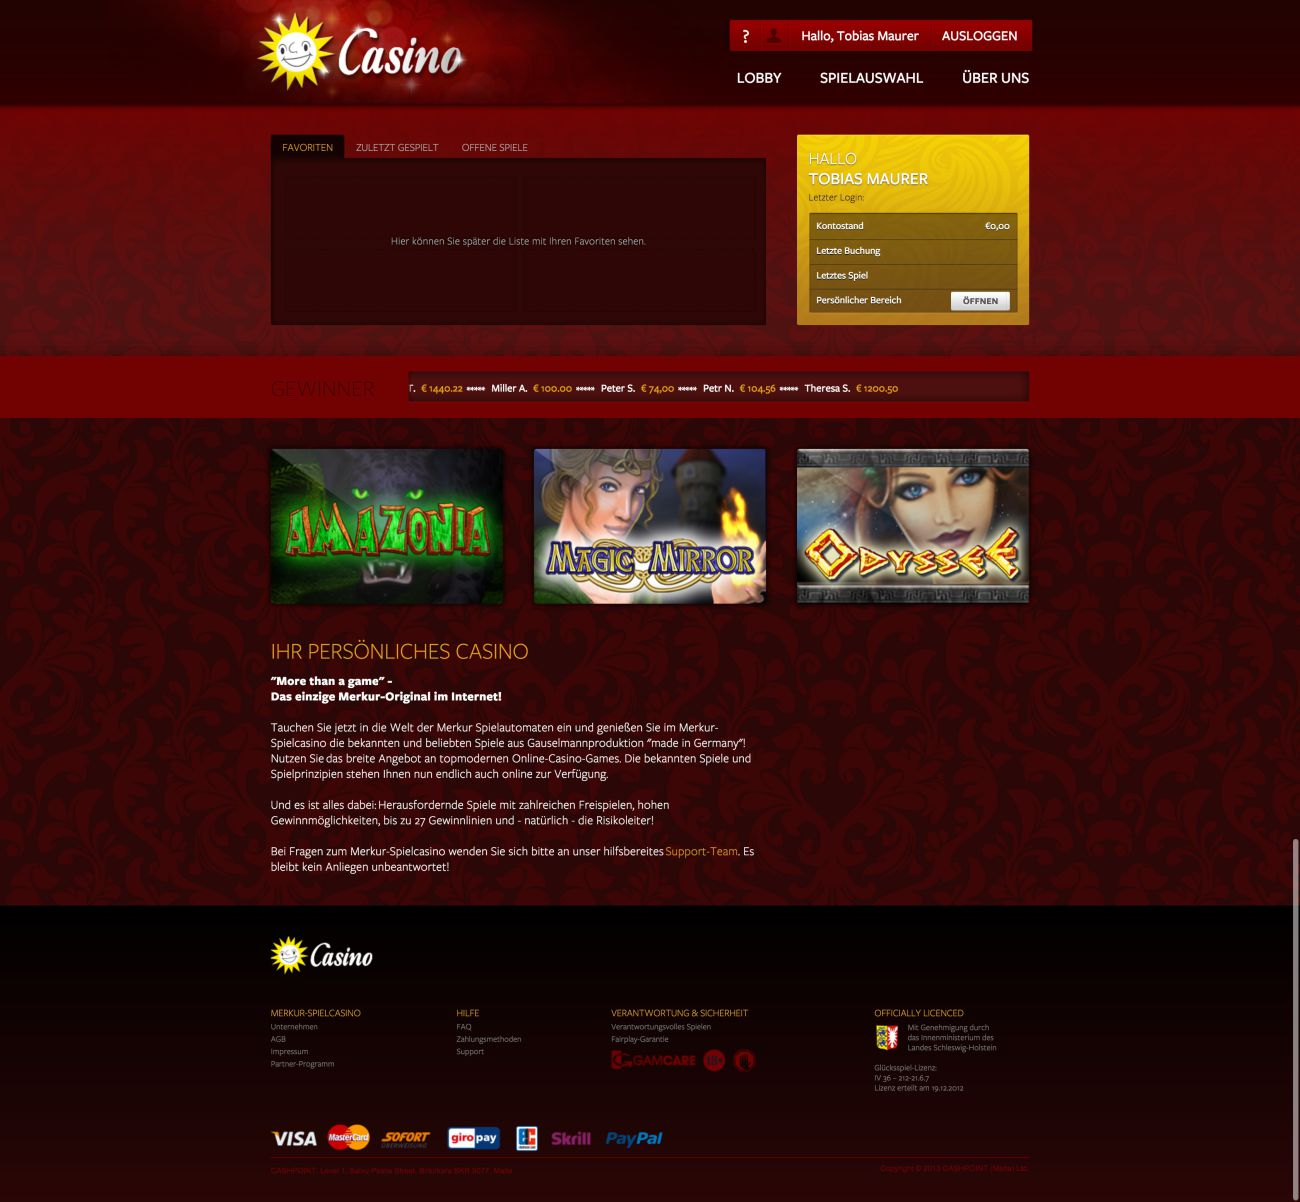 merkur slots online spielcasino online